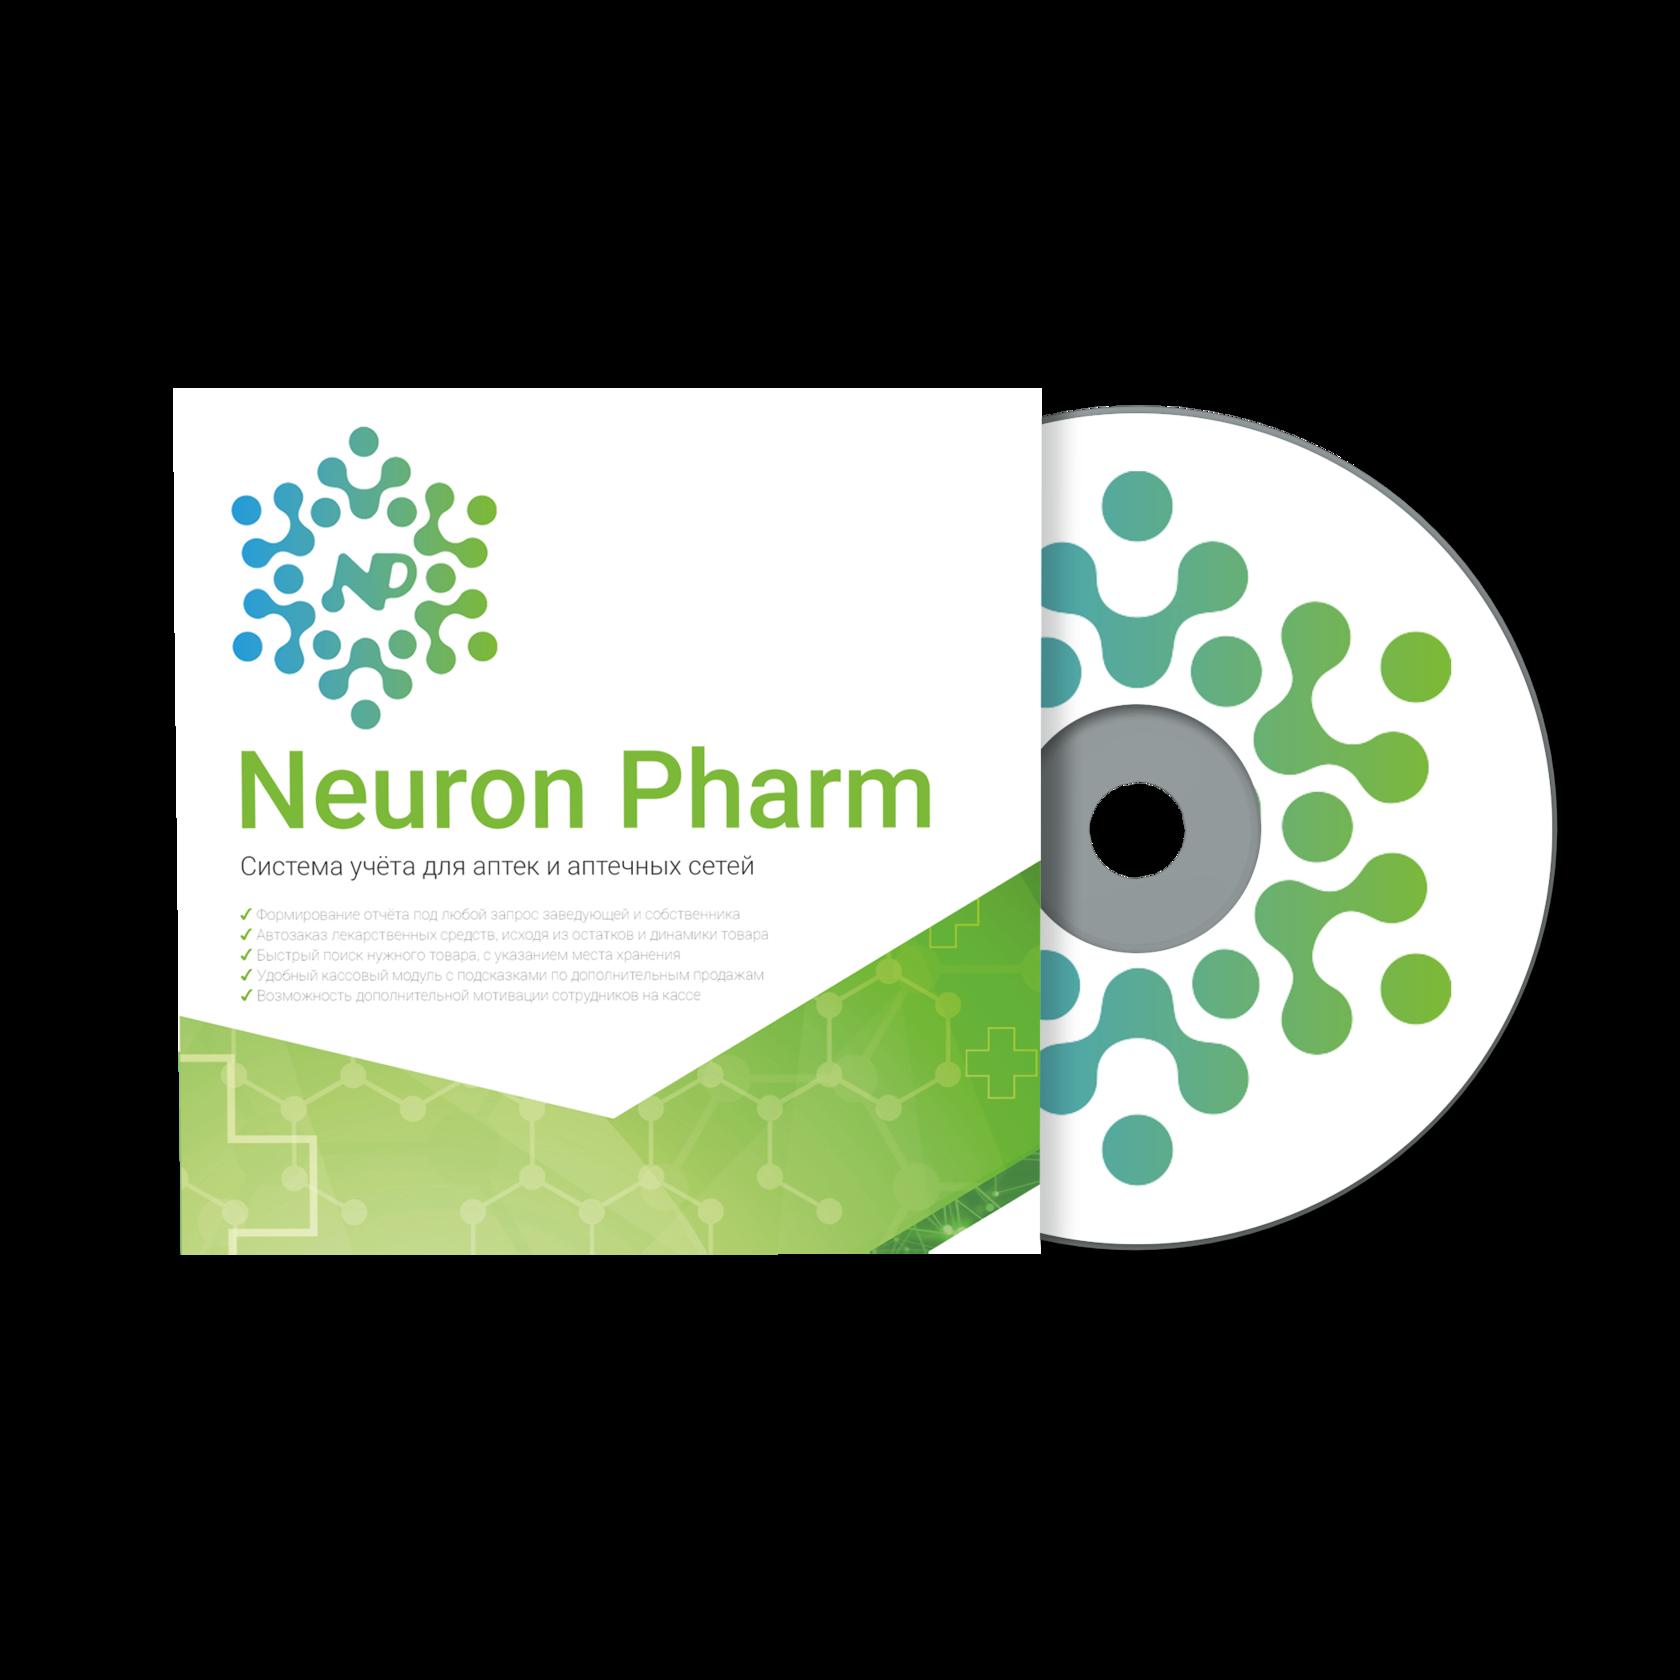 neuron pharm, нейрон фарм, программа для аптек, учёт в аптеке, автоматизация аптек, 1c аптека, лучшее по для аптек, бесплатное ПО для аптек, сводный прайс лист, бест аптека, инфо аптека, трейд аптека, стандарт н, фарм командир